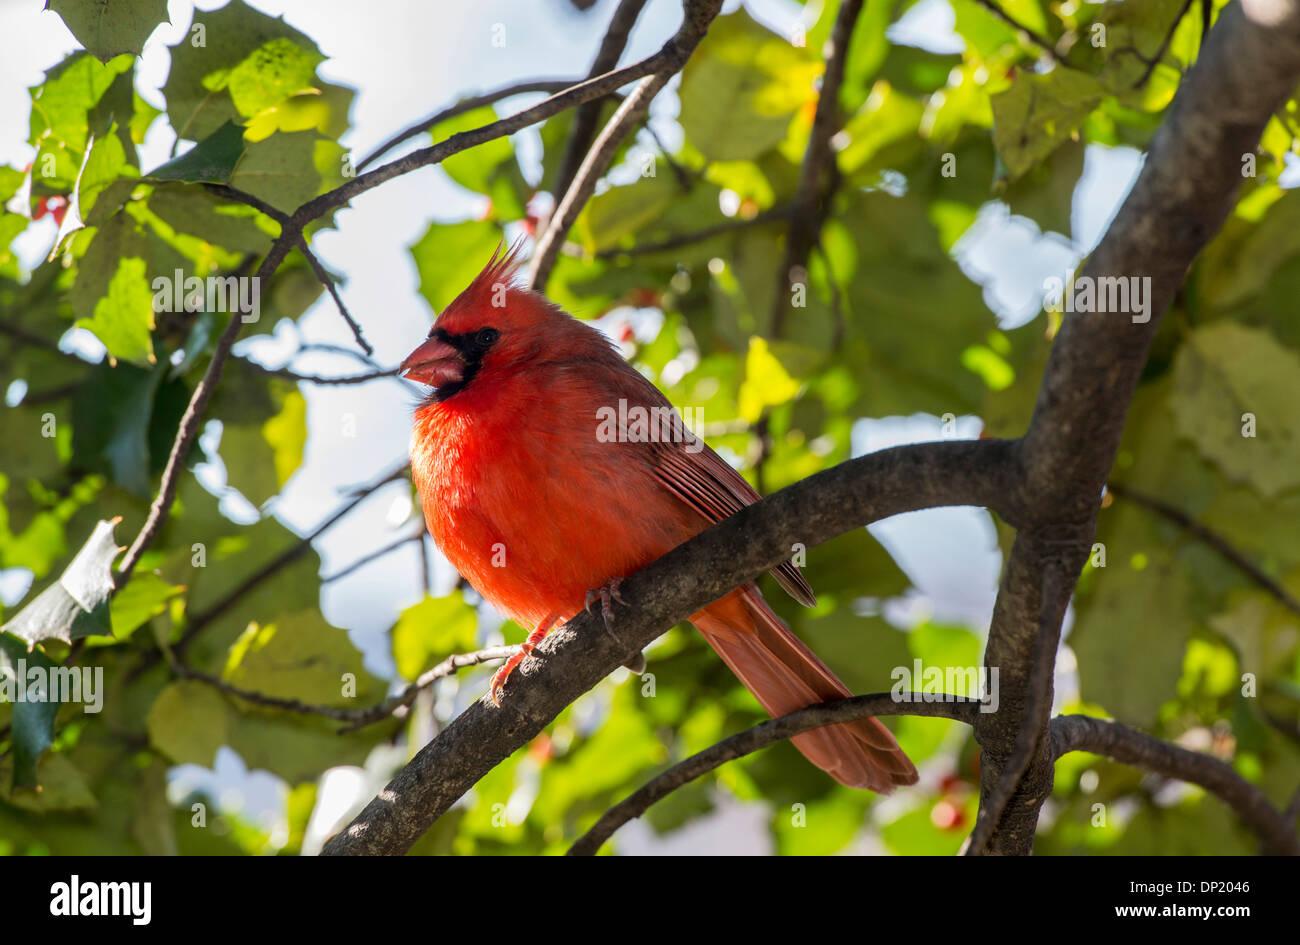 Cardenal norteño (Cardinalis cardinalis), Central Park, New York City, New York, EE.UU. Foto de stock